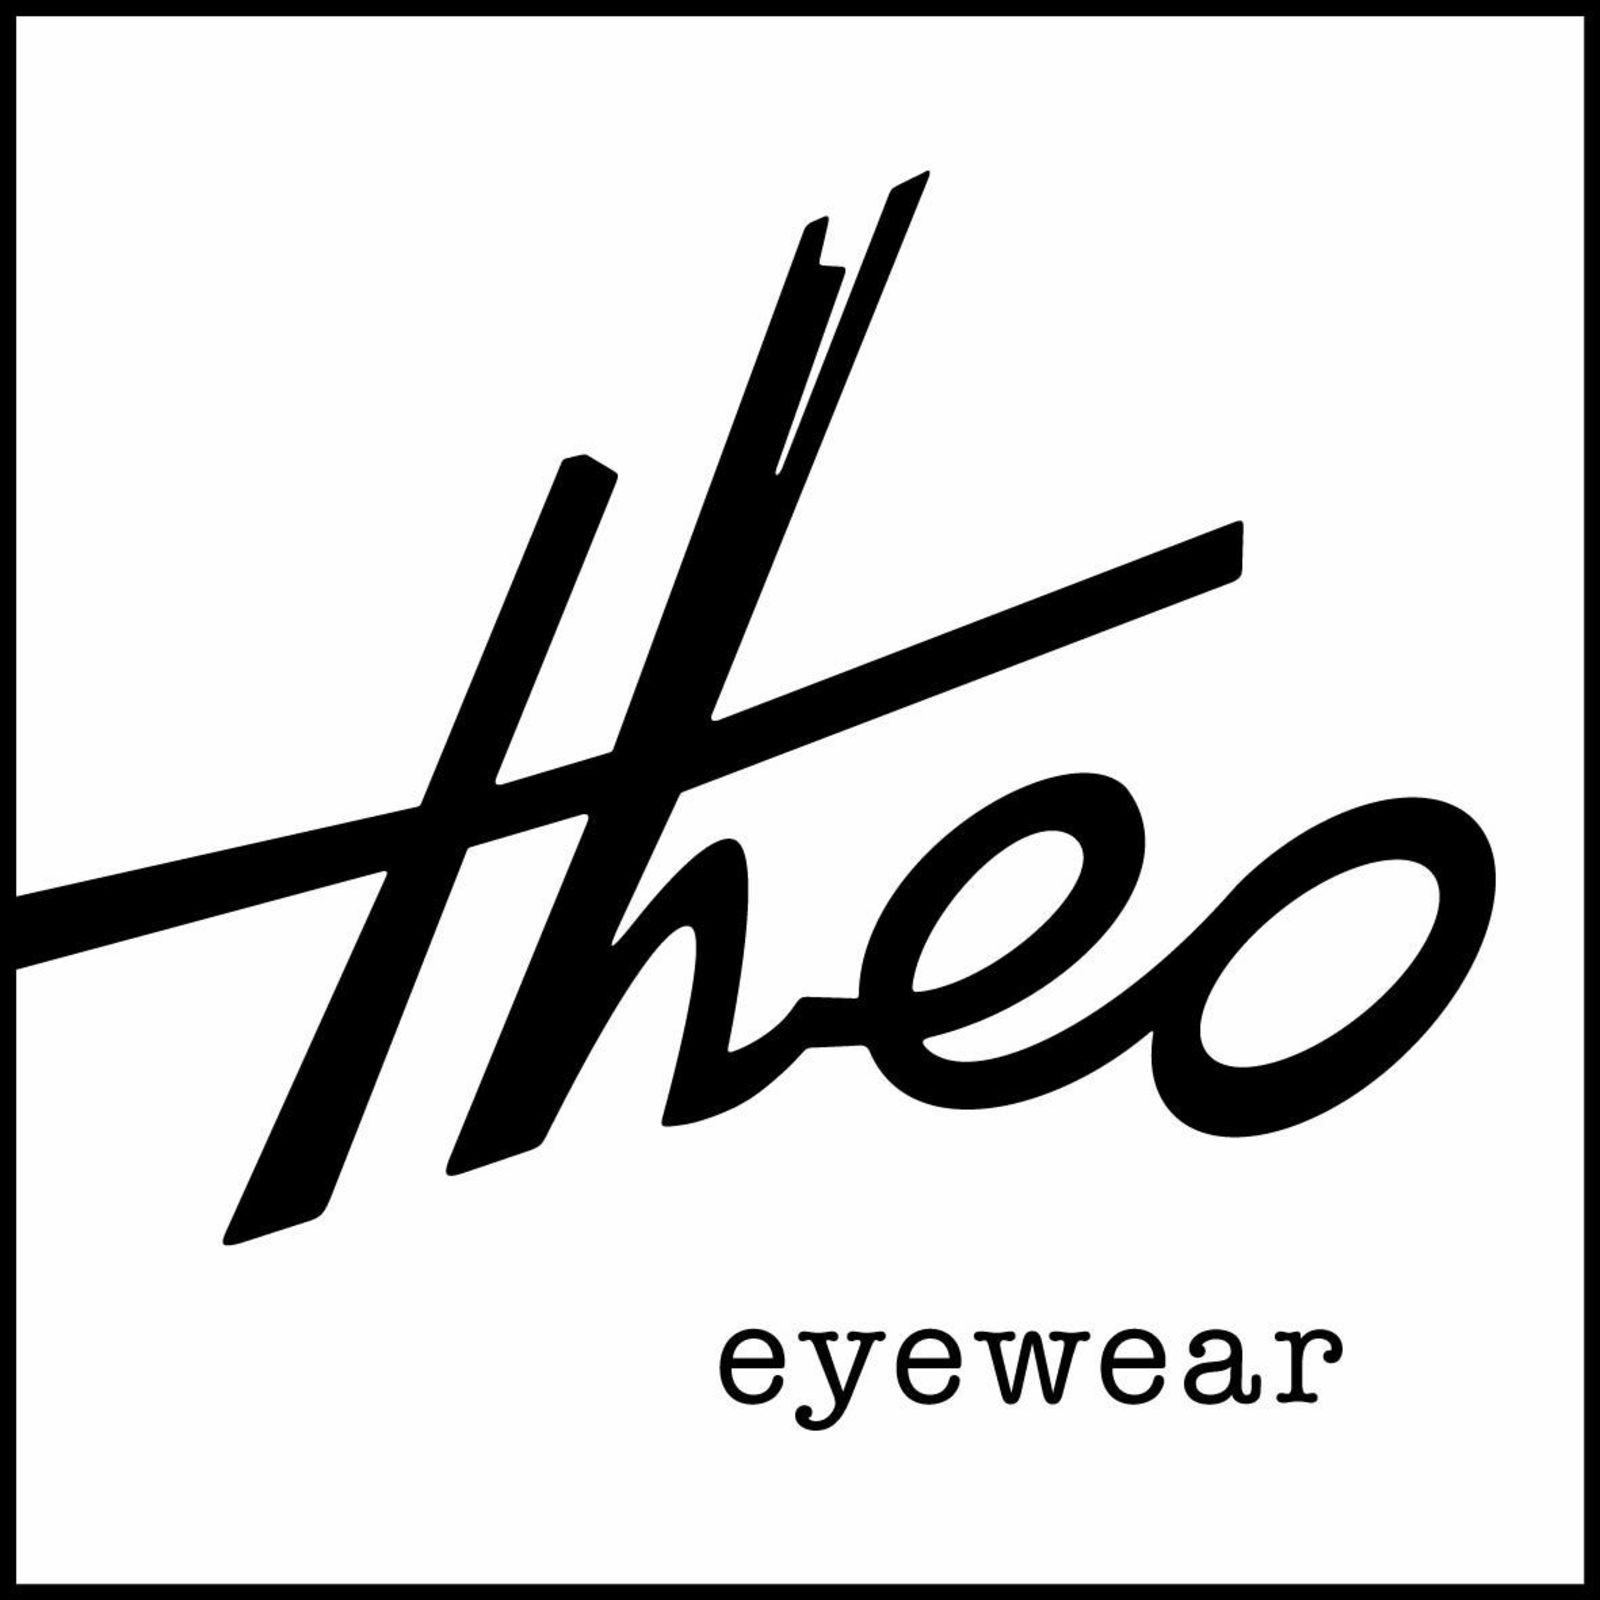 theo eyewear (Bild 1)